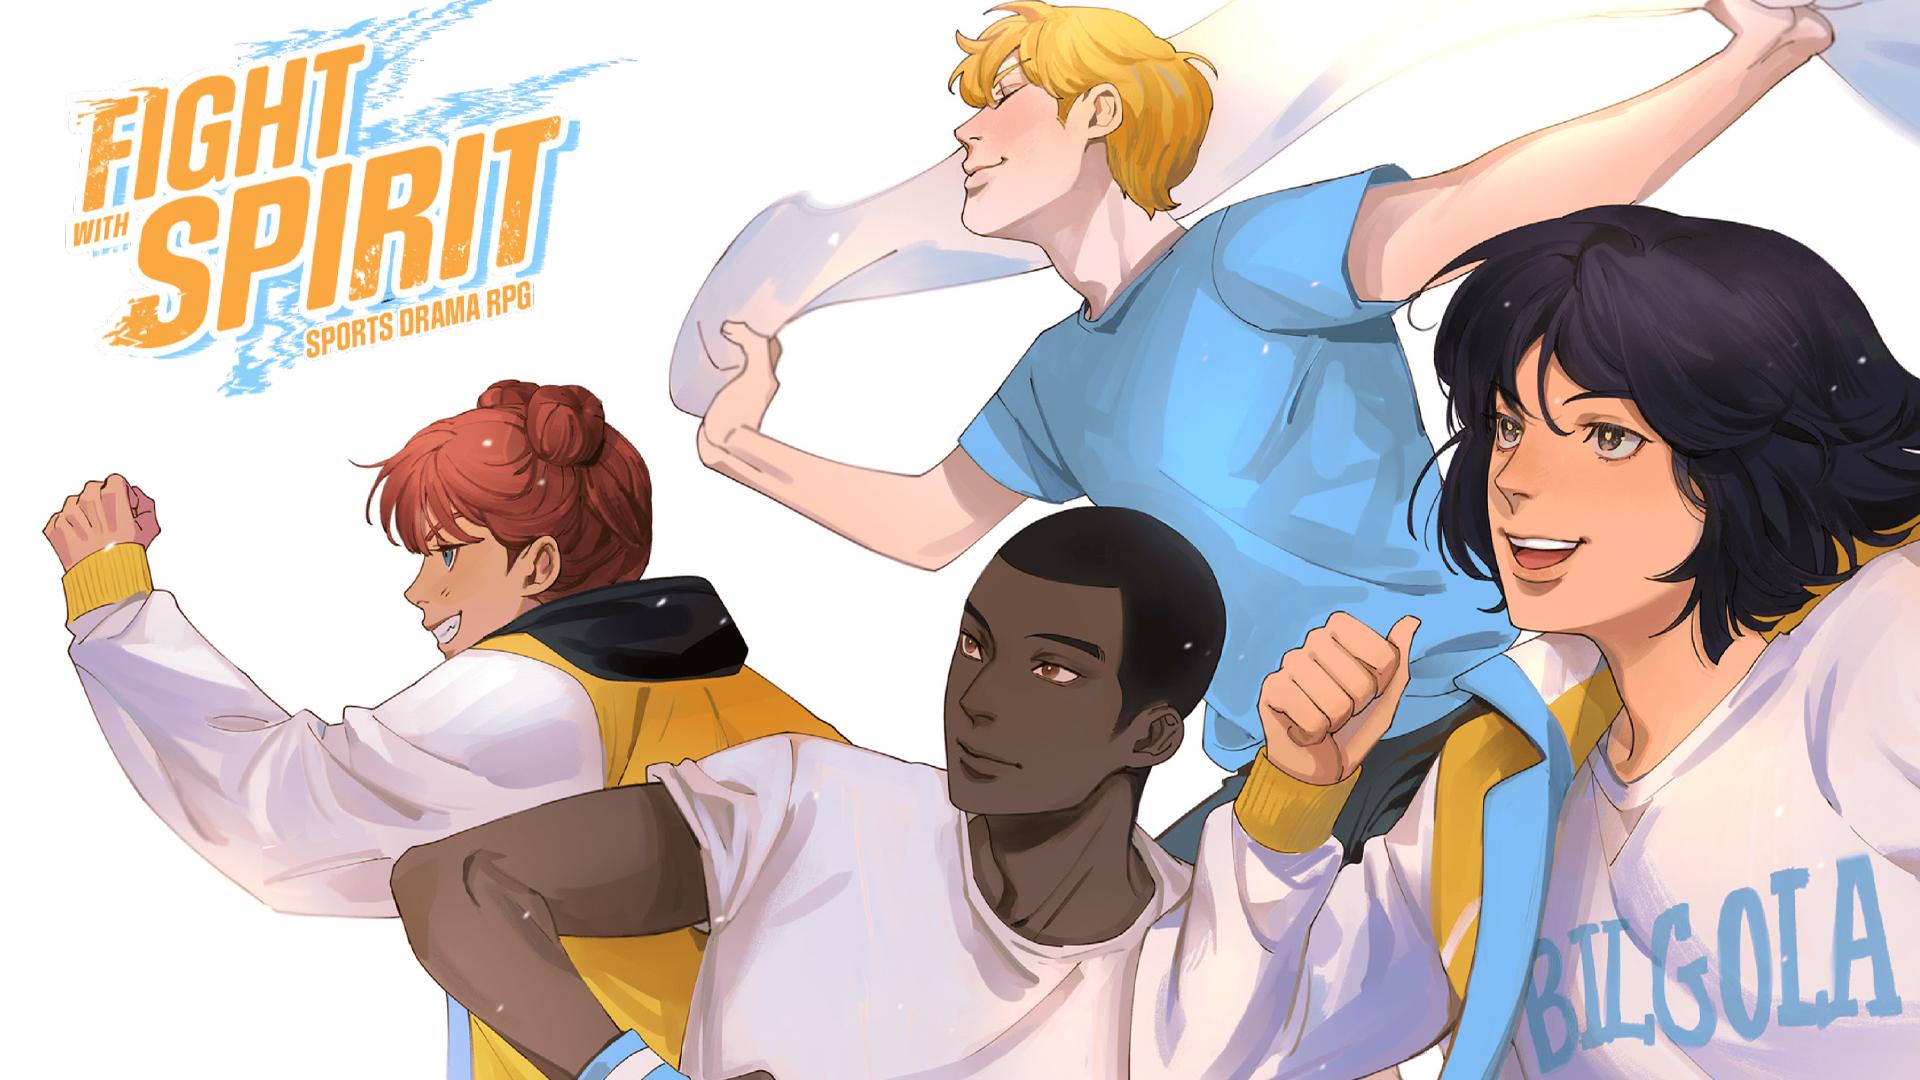 Fight with Spirit RPG artwork